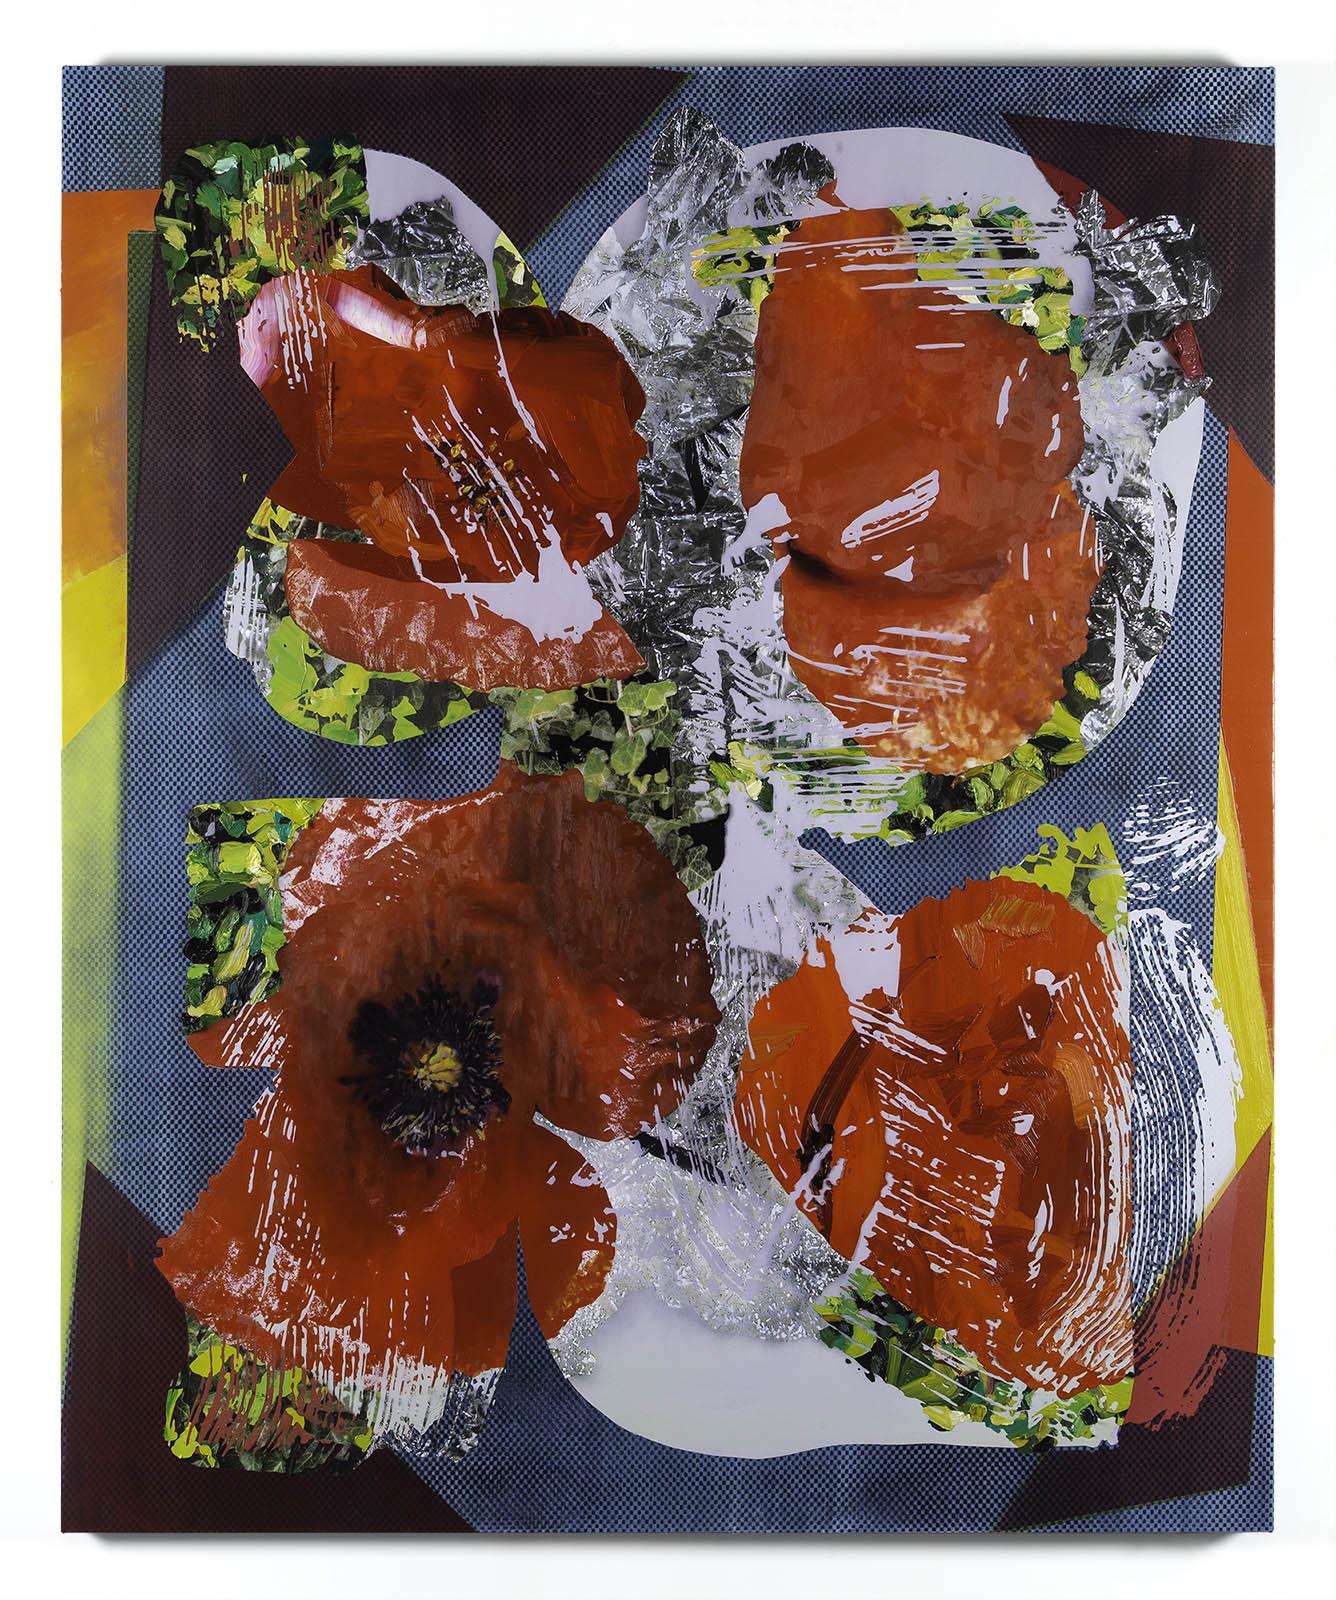 Jimmy Baker, American artist, painting, digital printing : Your Pleasure Centers painting